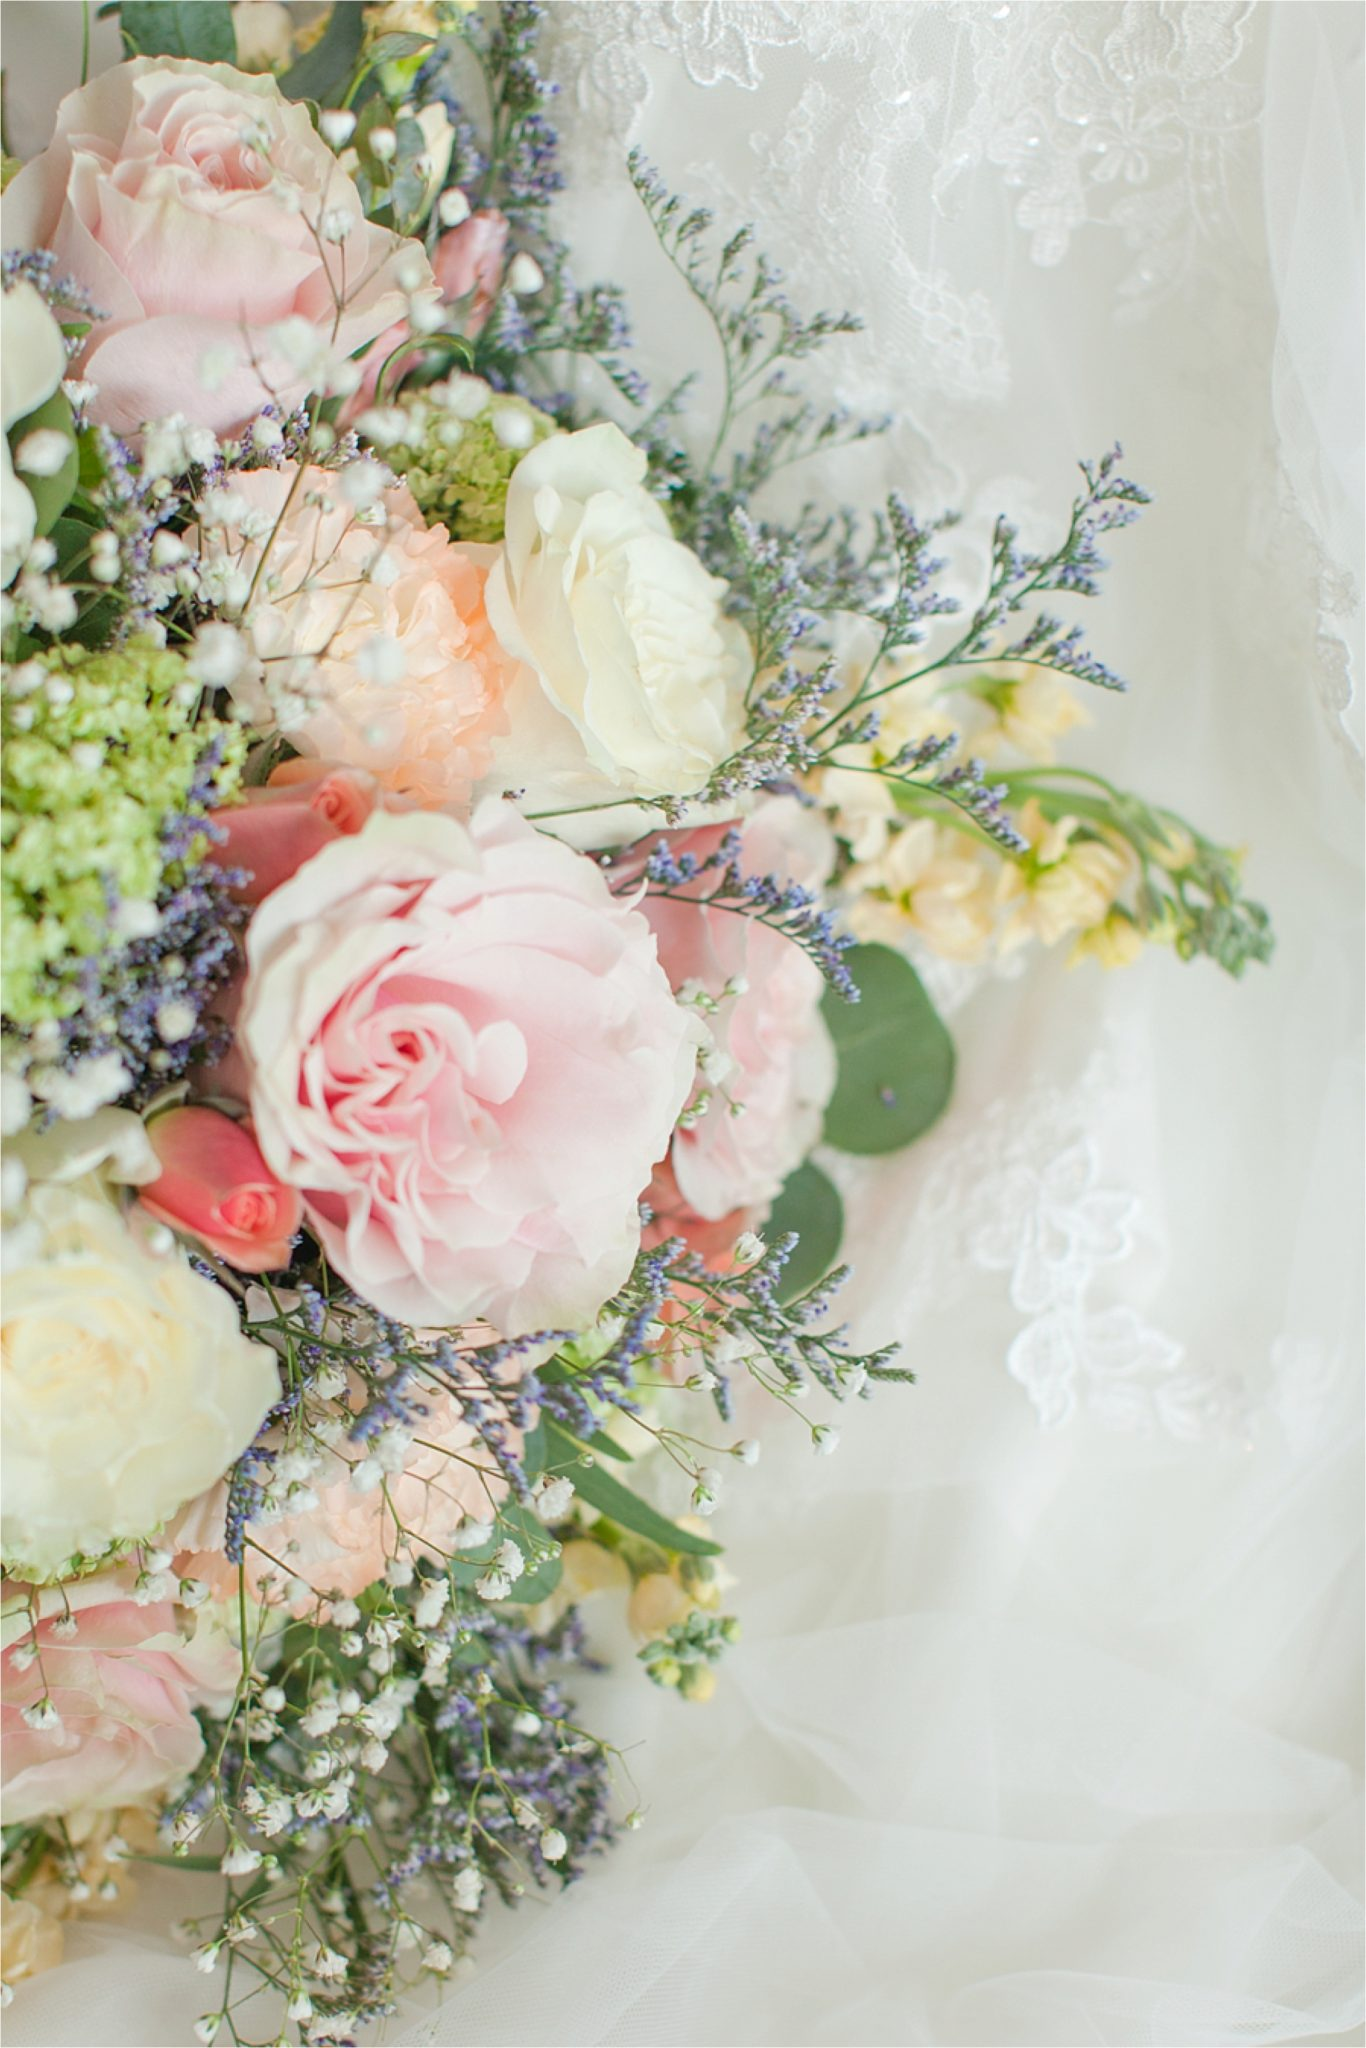 Kananaskis Canada Wedding at the Delta Lodge-Kaitlin & Ricky-Alabama wedding photographer-Lodge wedding-Wedding florals